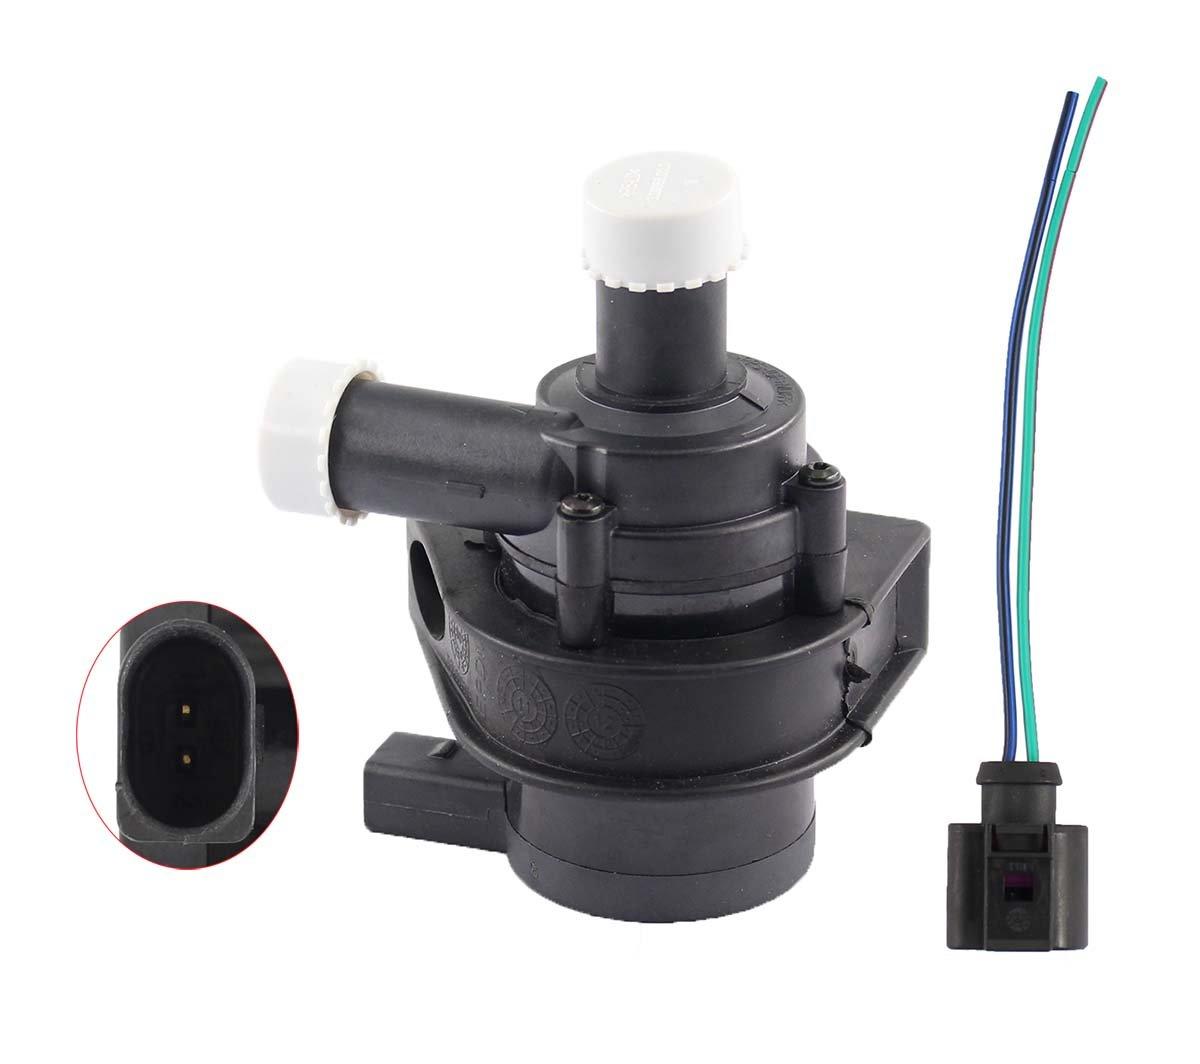 XtremeAmazing New Auxiliary Cooling Water Pump for VW Tiguan Passat Jetta Golf CC GIt Audi A3 TT Q3